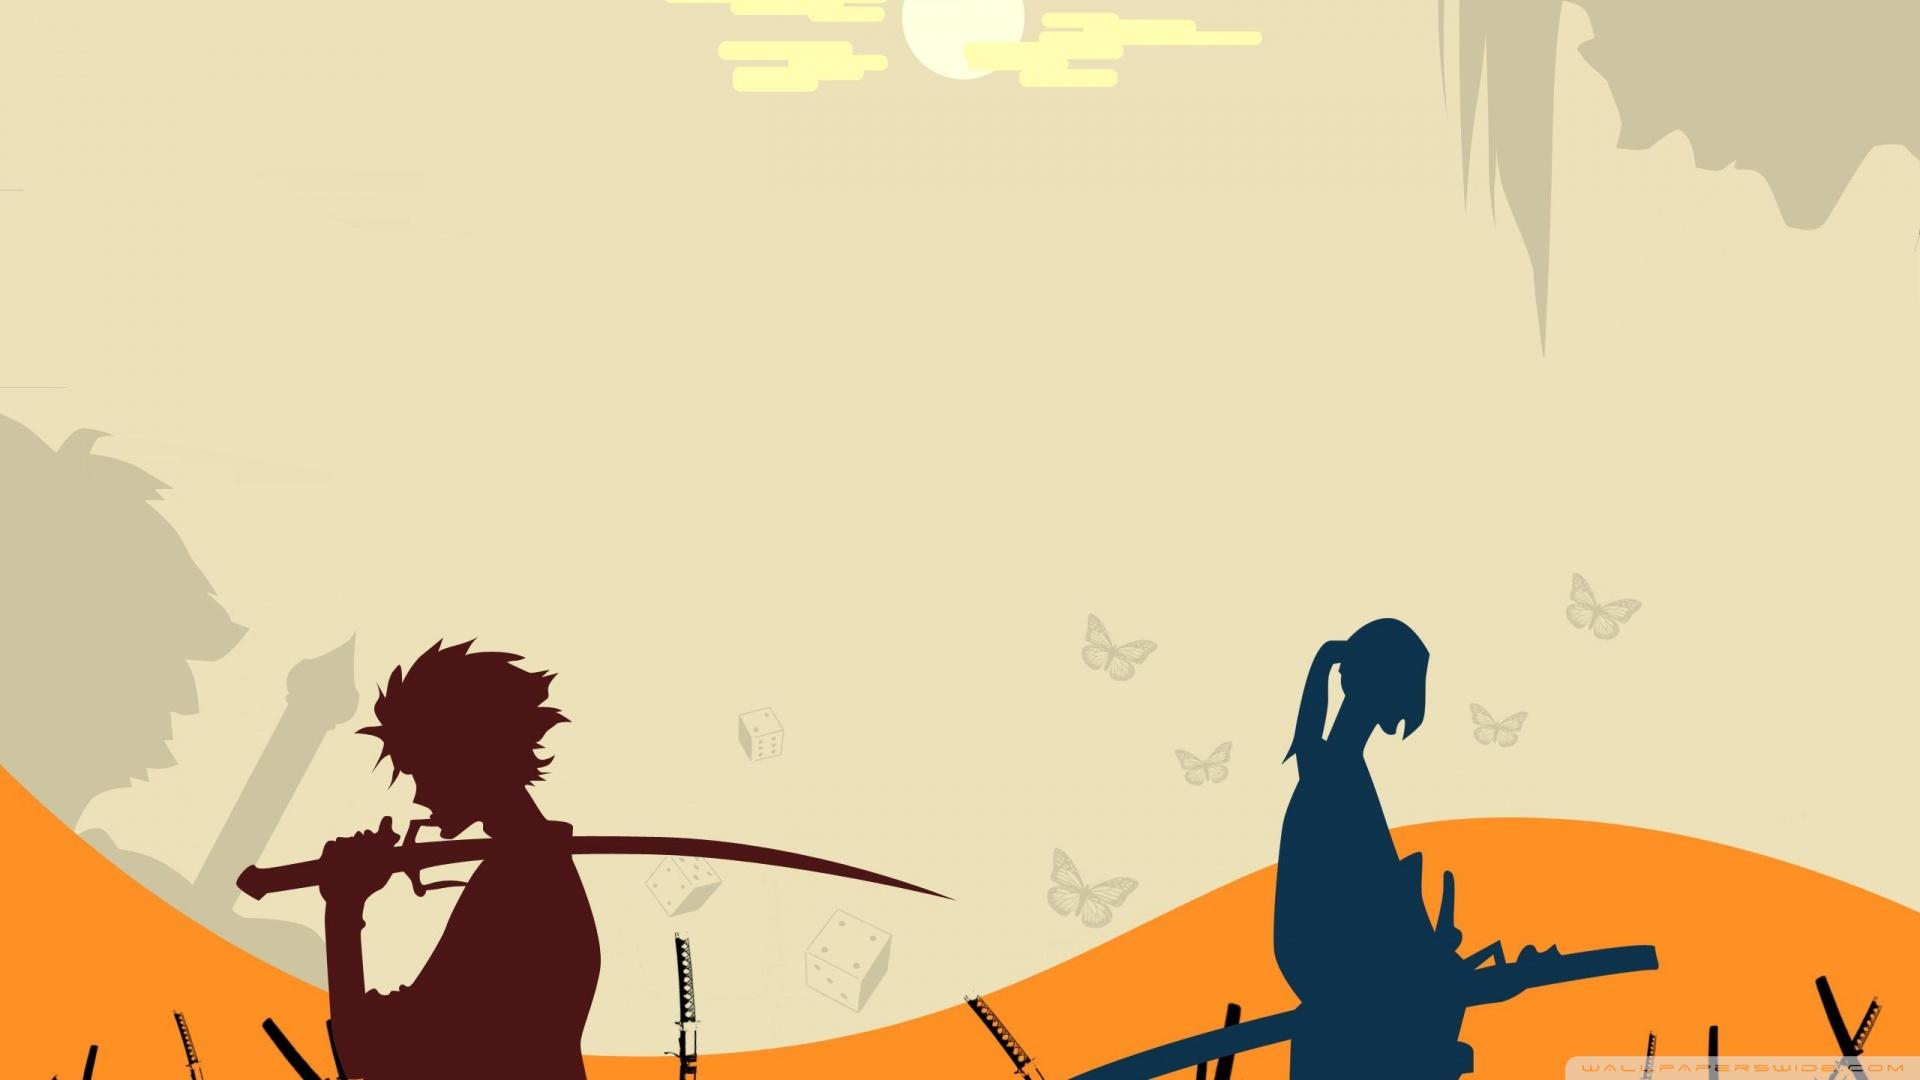 Samurai Champloo Wallpaper 1920x1080 Samurai Champloo 1920x1080